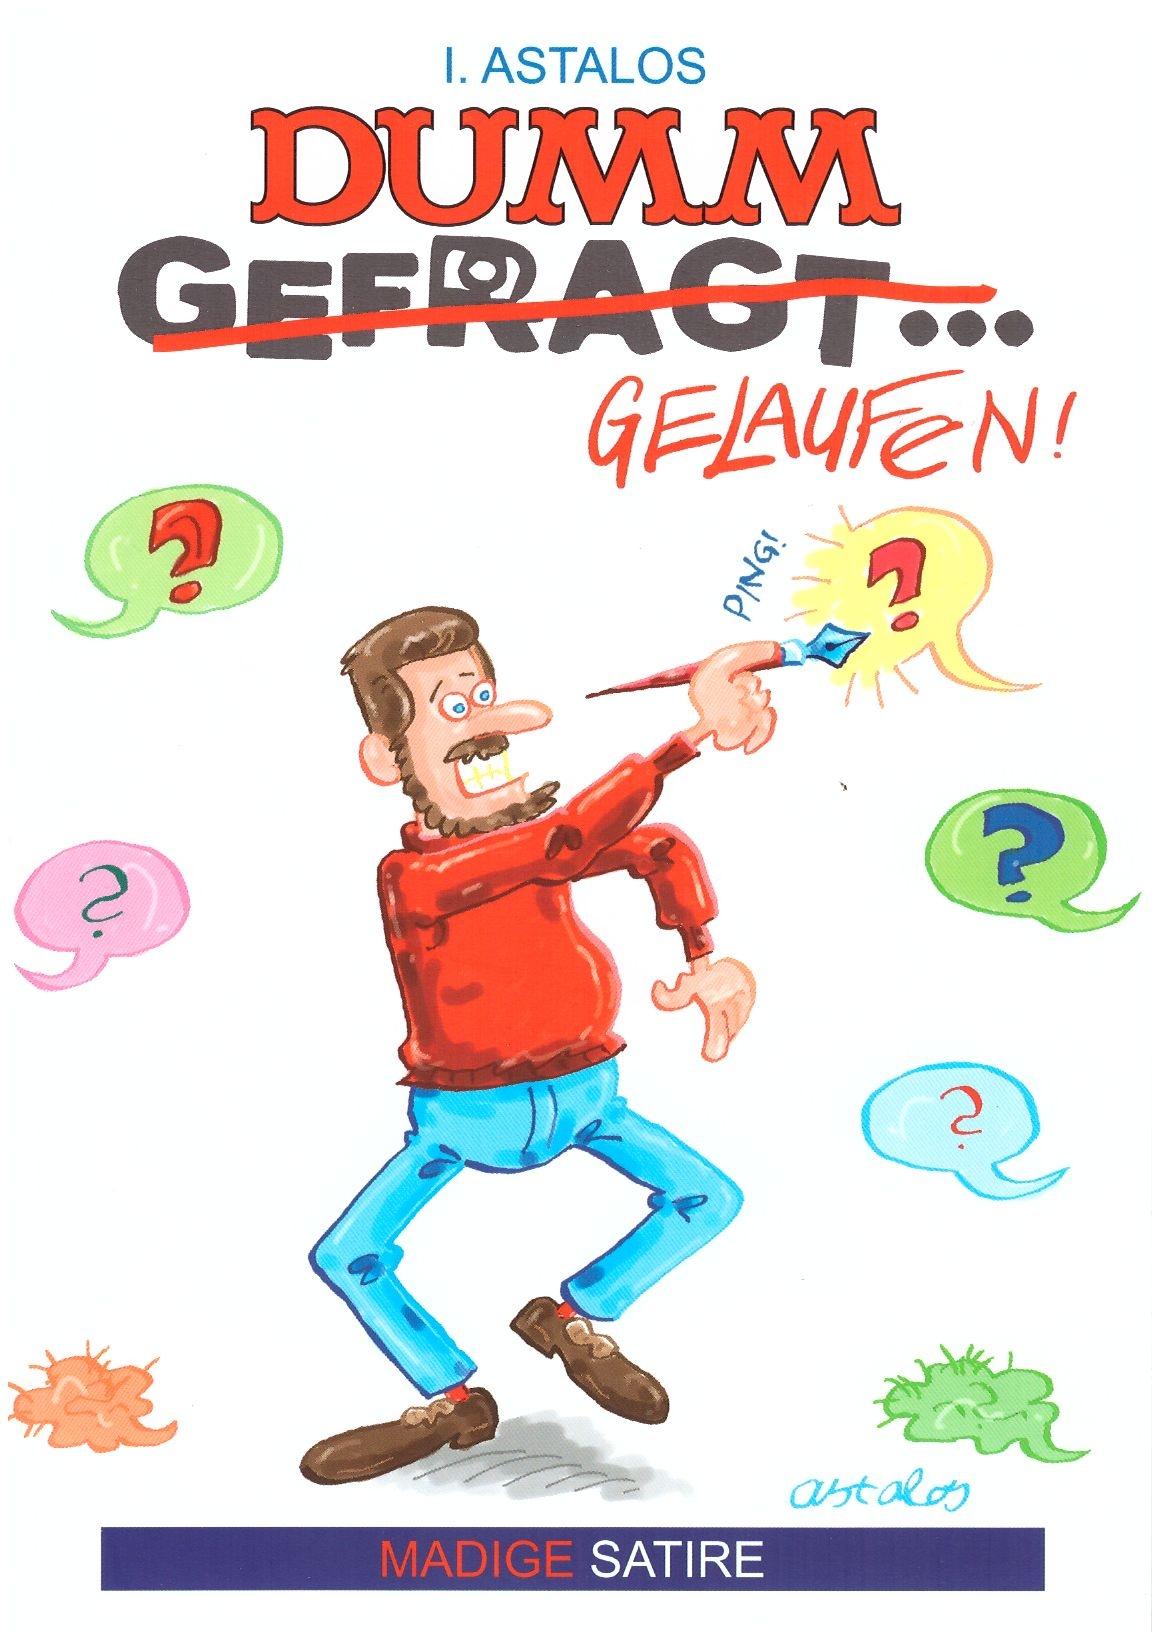 Dumm Gelaufen! • Germany • 2nd Edition - Dino/Panini